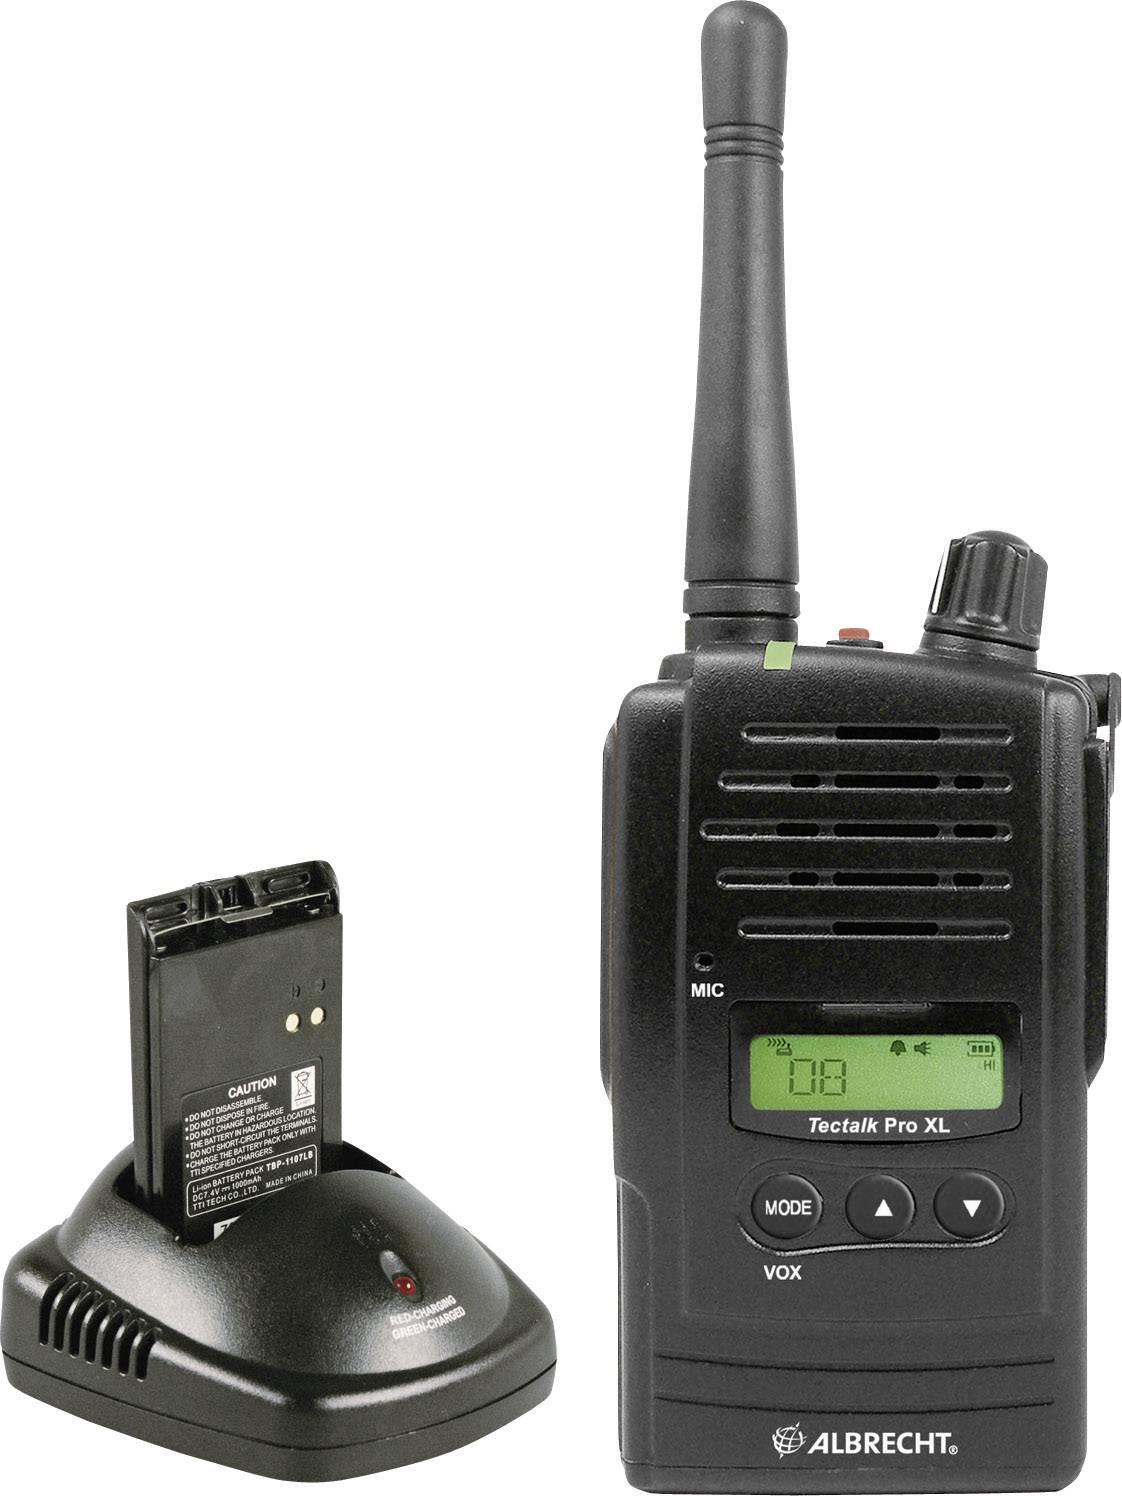 PMR rádiostanica Albrecht Tectalk Pro